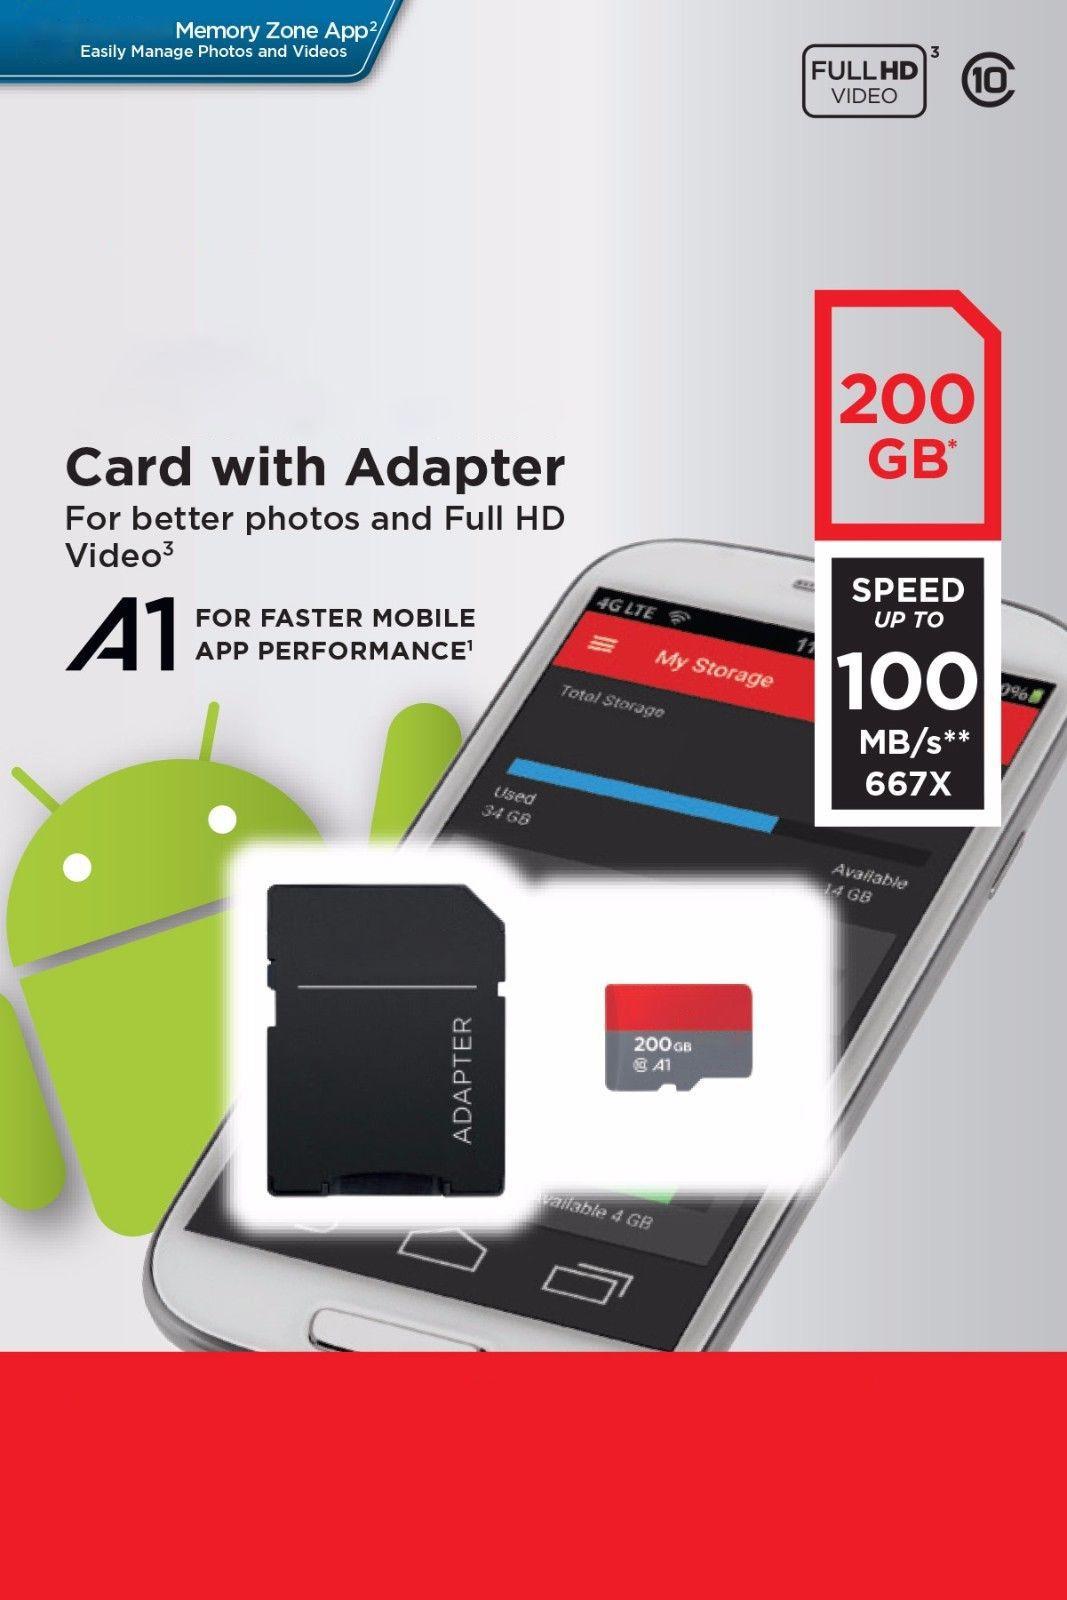 Scheda di memoria Micro SD Ultra A1 256 GB 200 GB 128 GB 64 GB 32 GB 98 MB / s 100 MB / s UHS-I C10 TF Card con adattatore